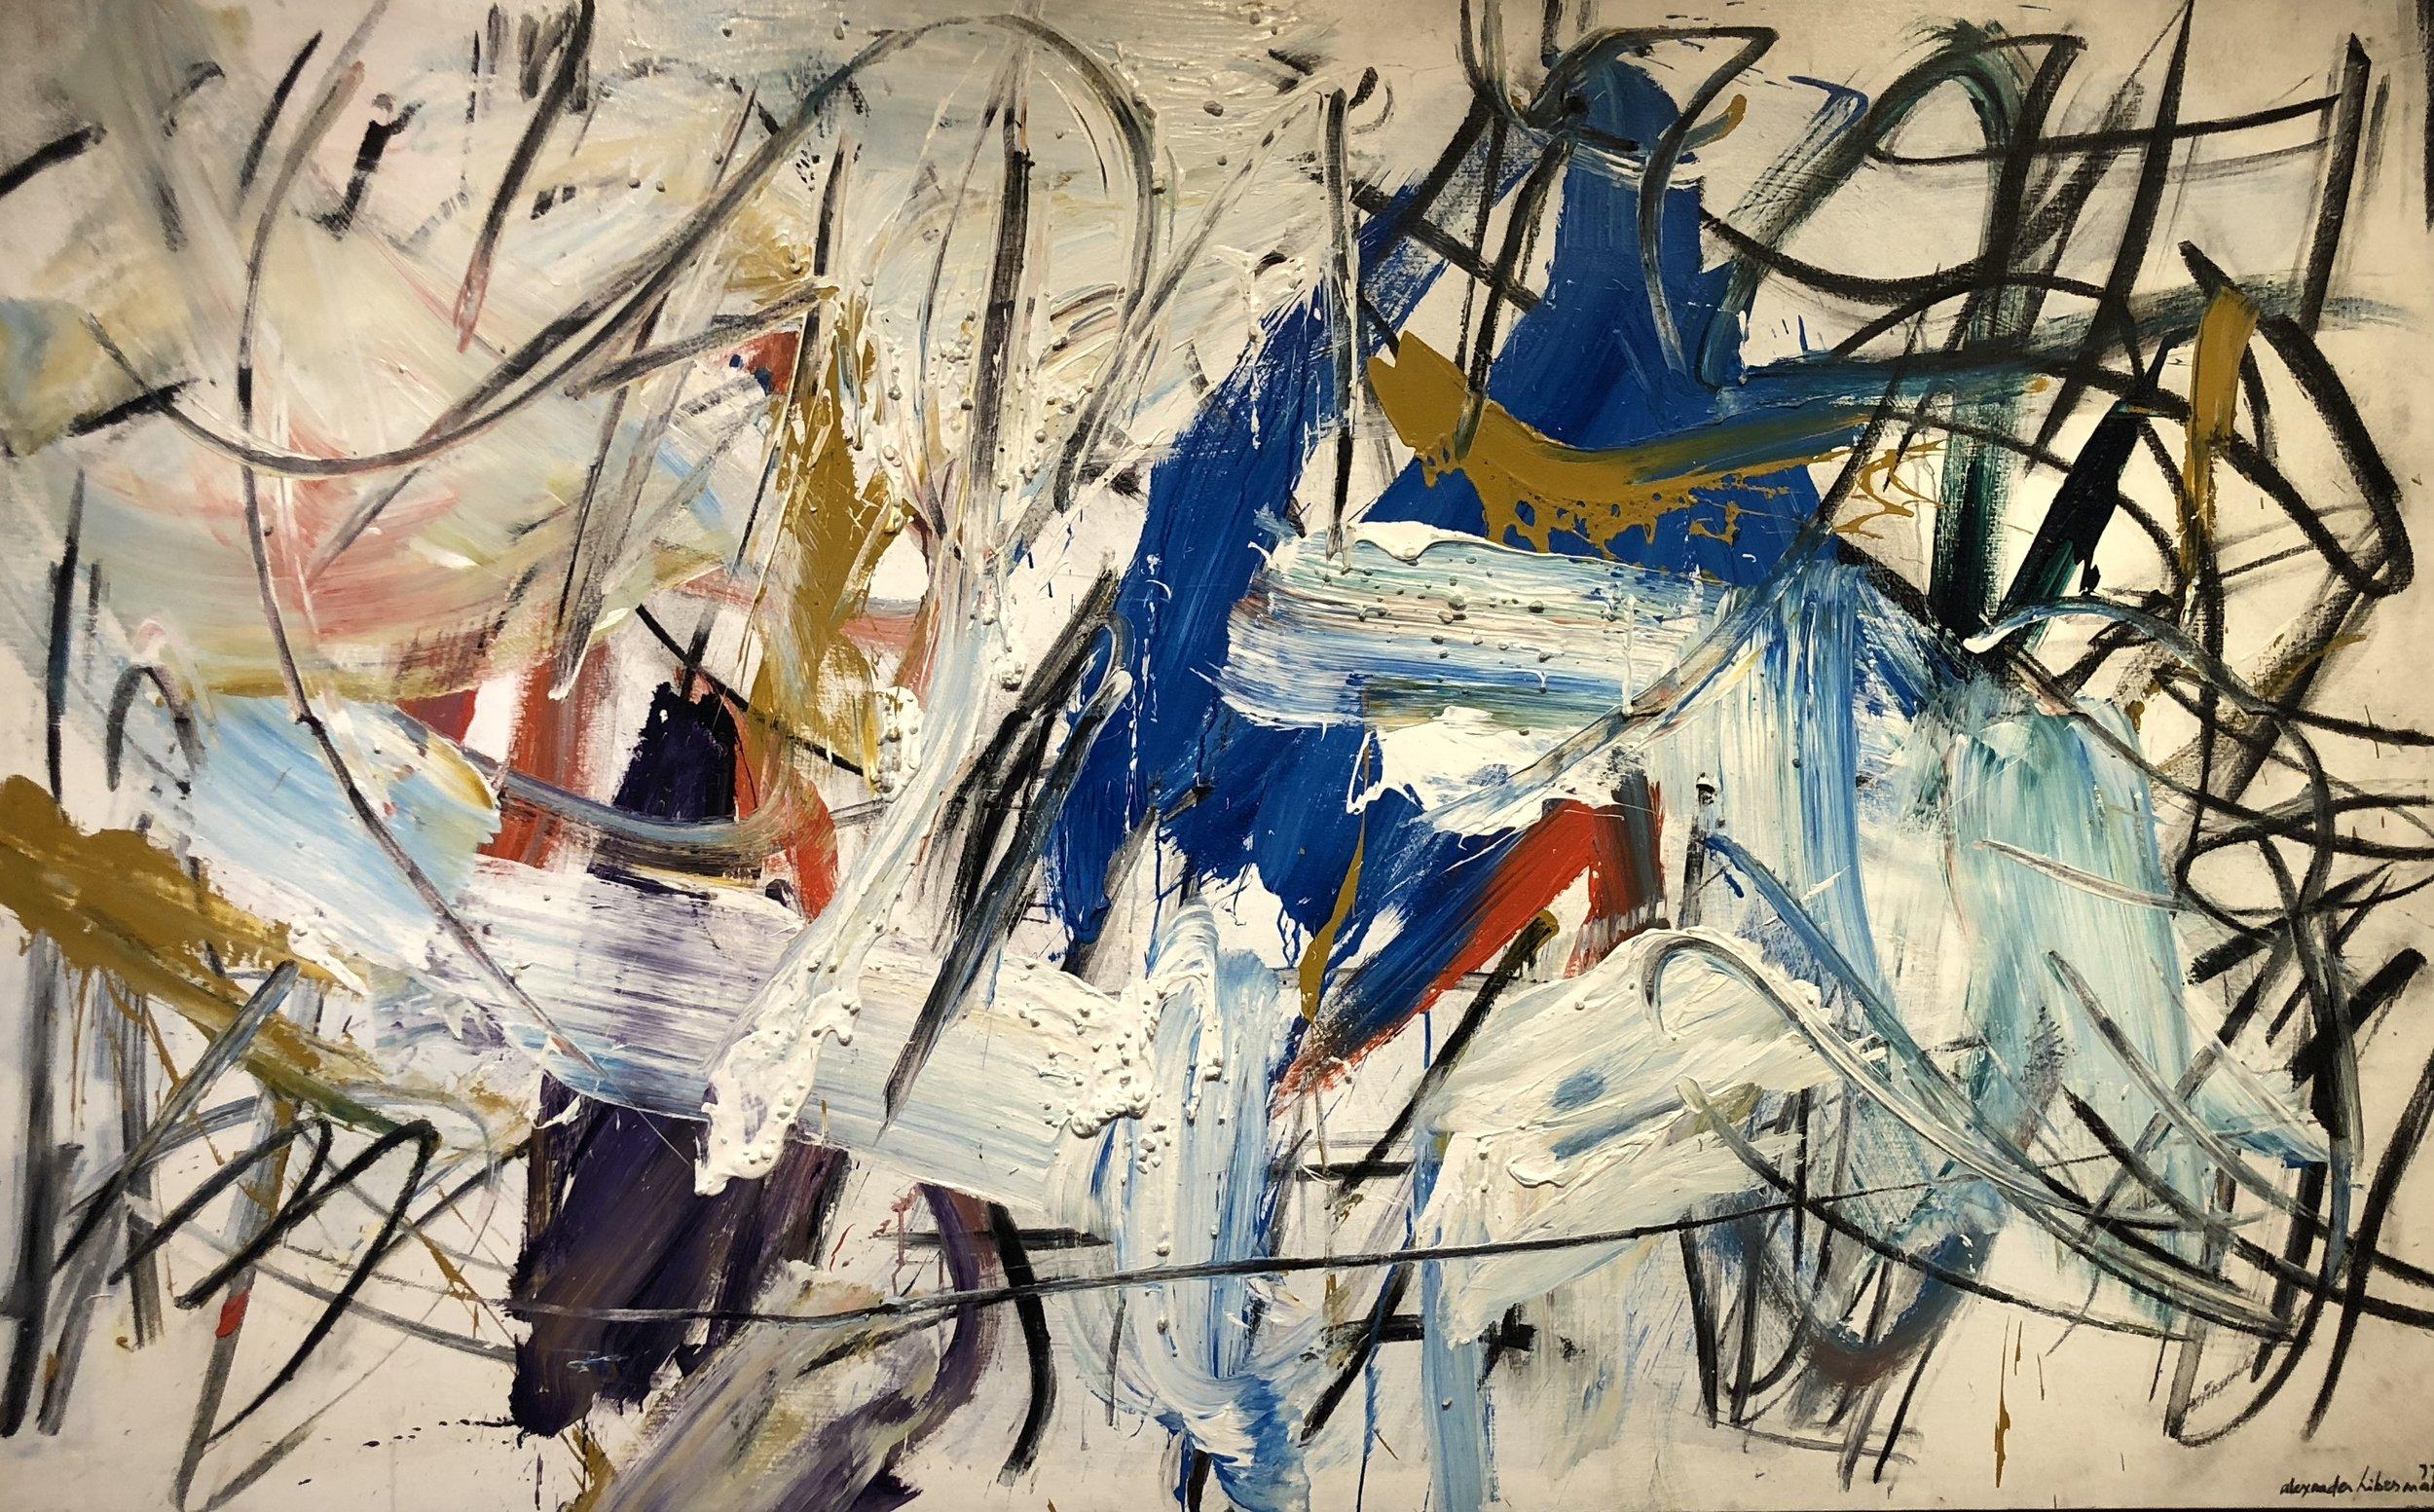 Erg I , 1977 Acrylic on canvas 60 x 96 inches